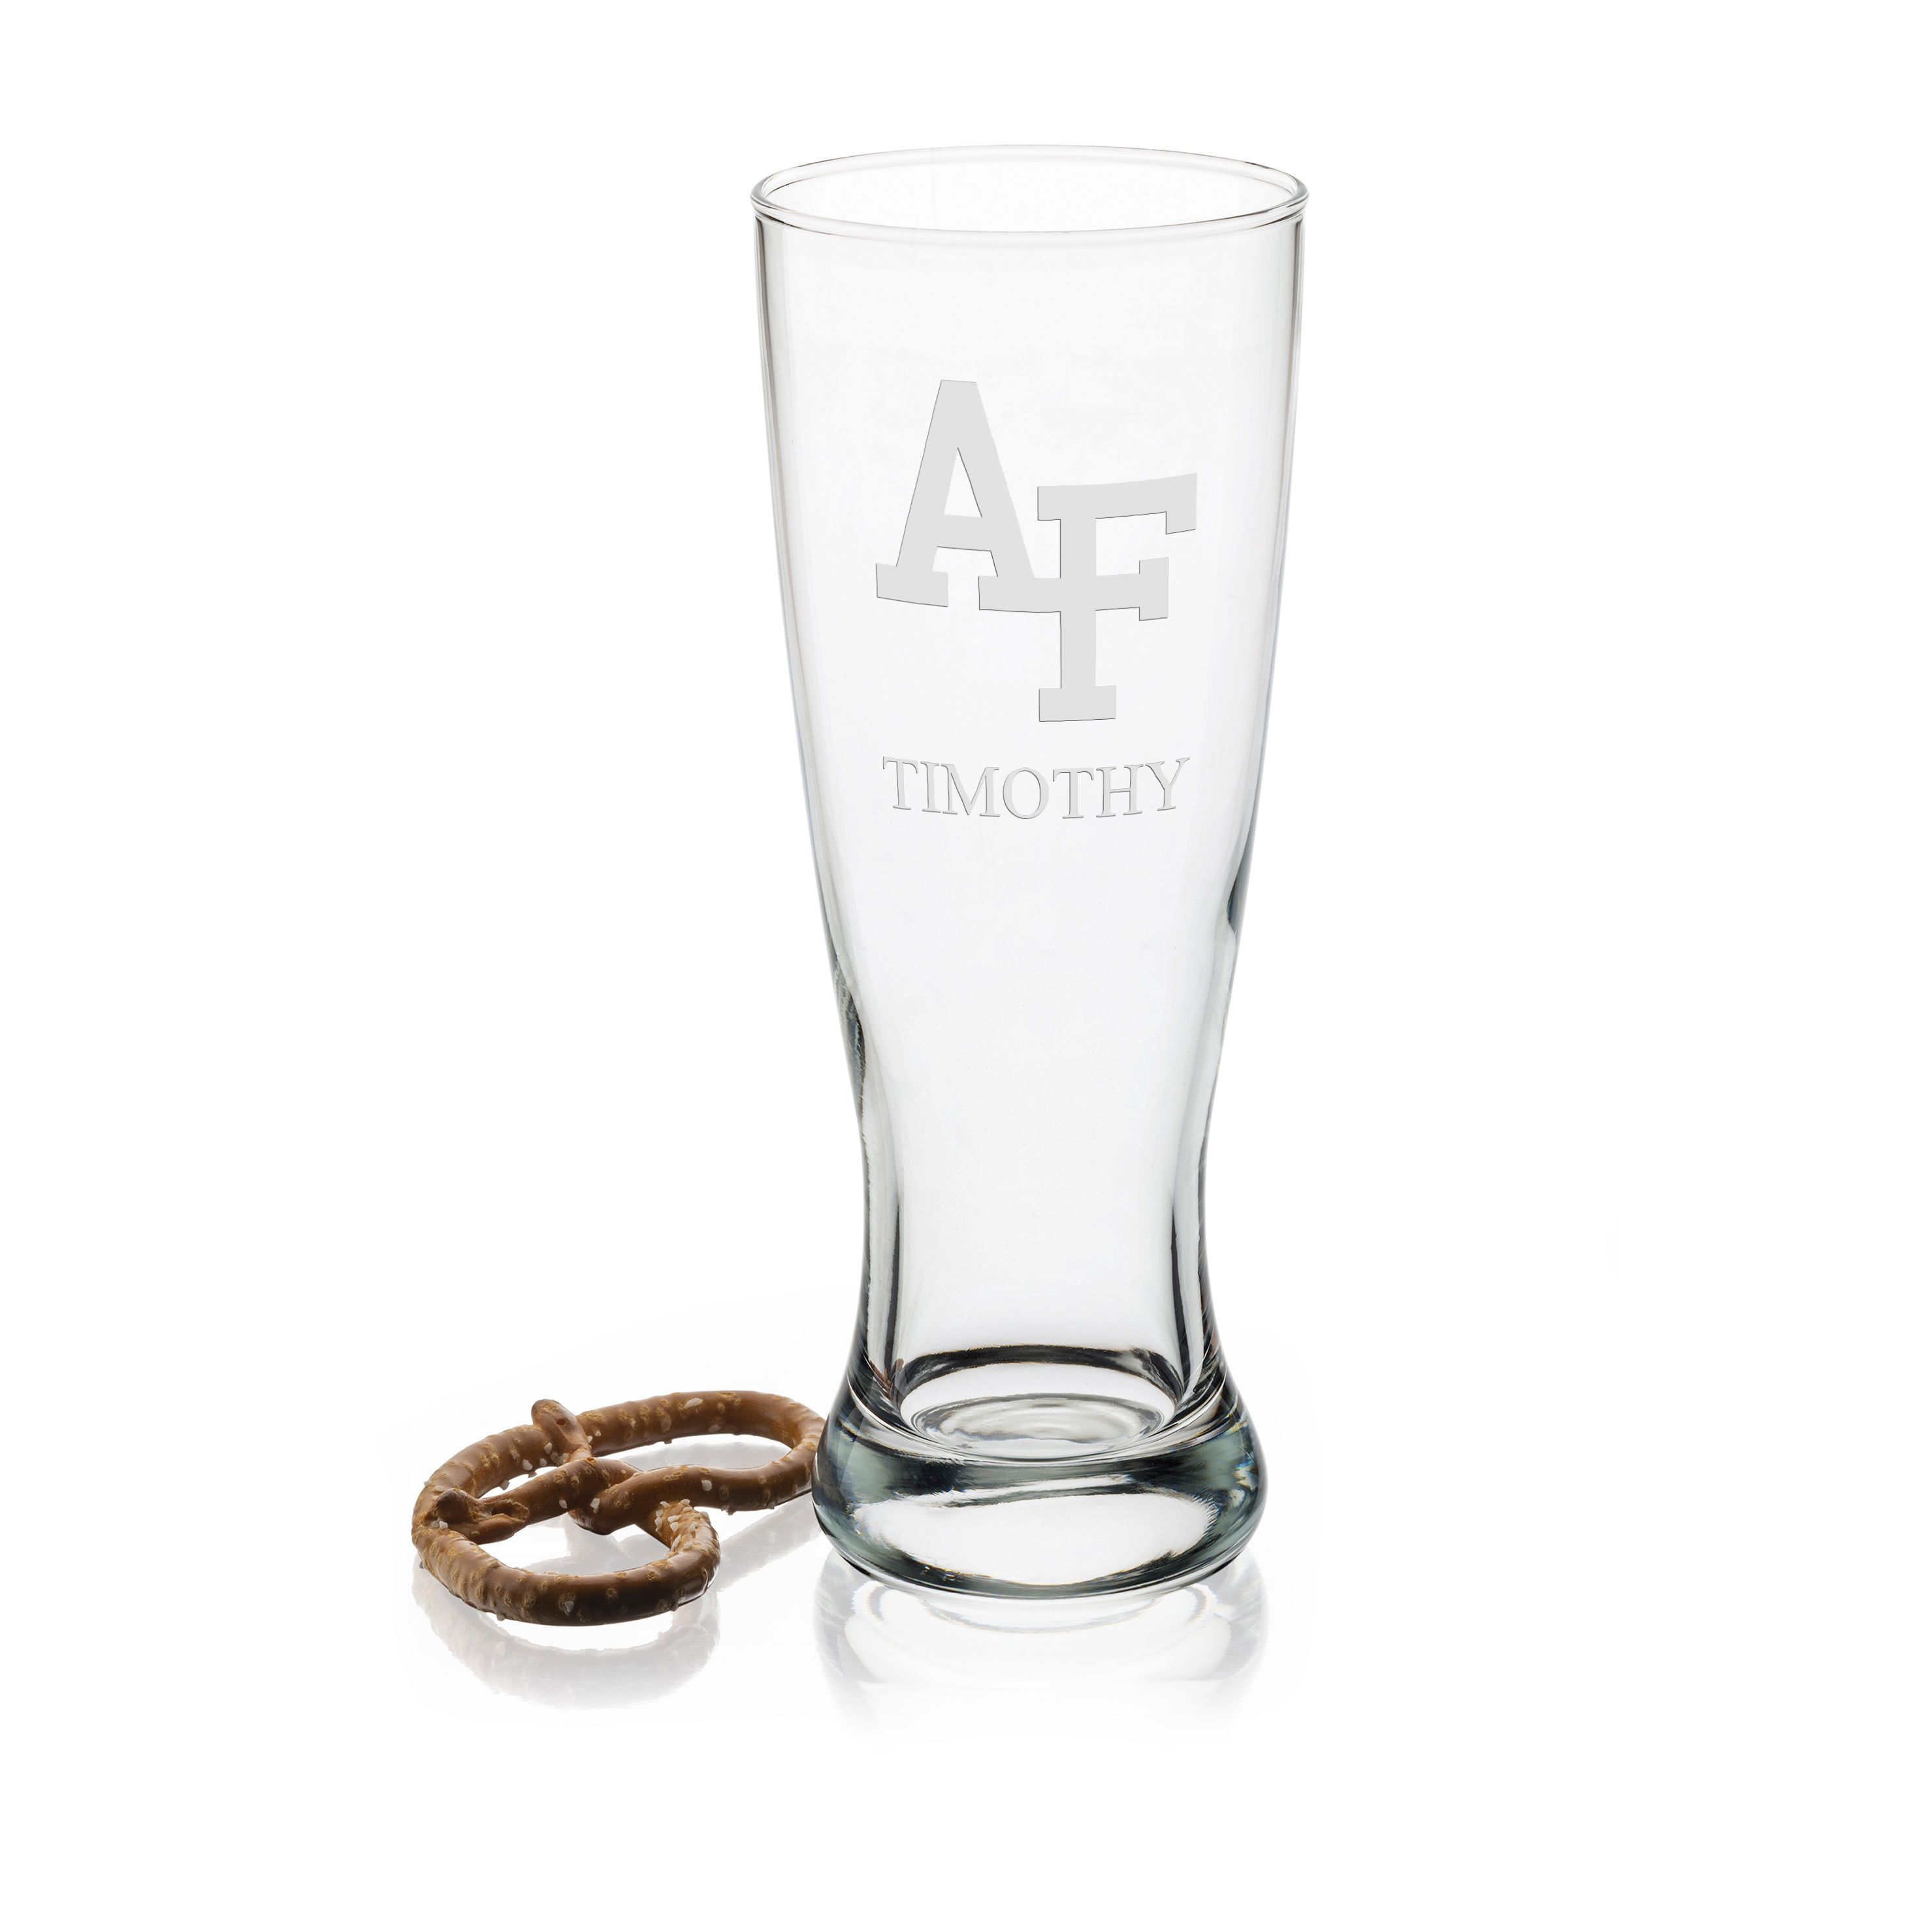 USAFA Tall 20oz Pilsner Glasses - Set of 2